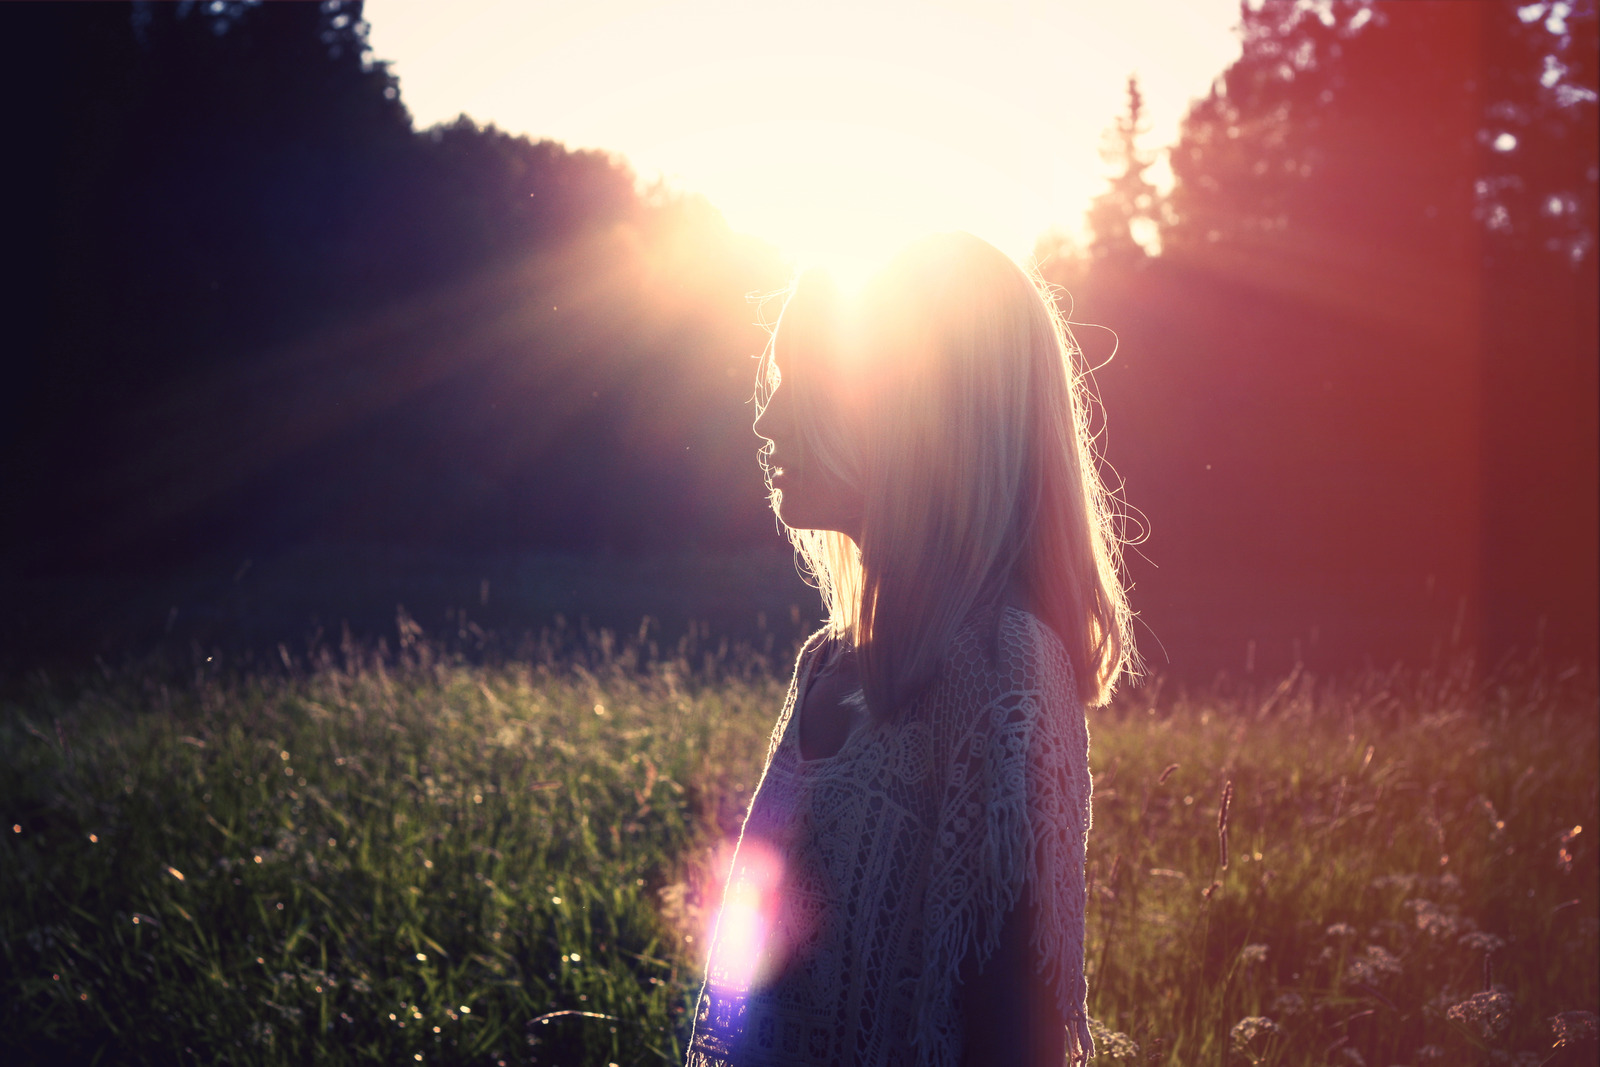 Témoignage de ménopause : ma libido avait disparu